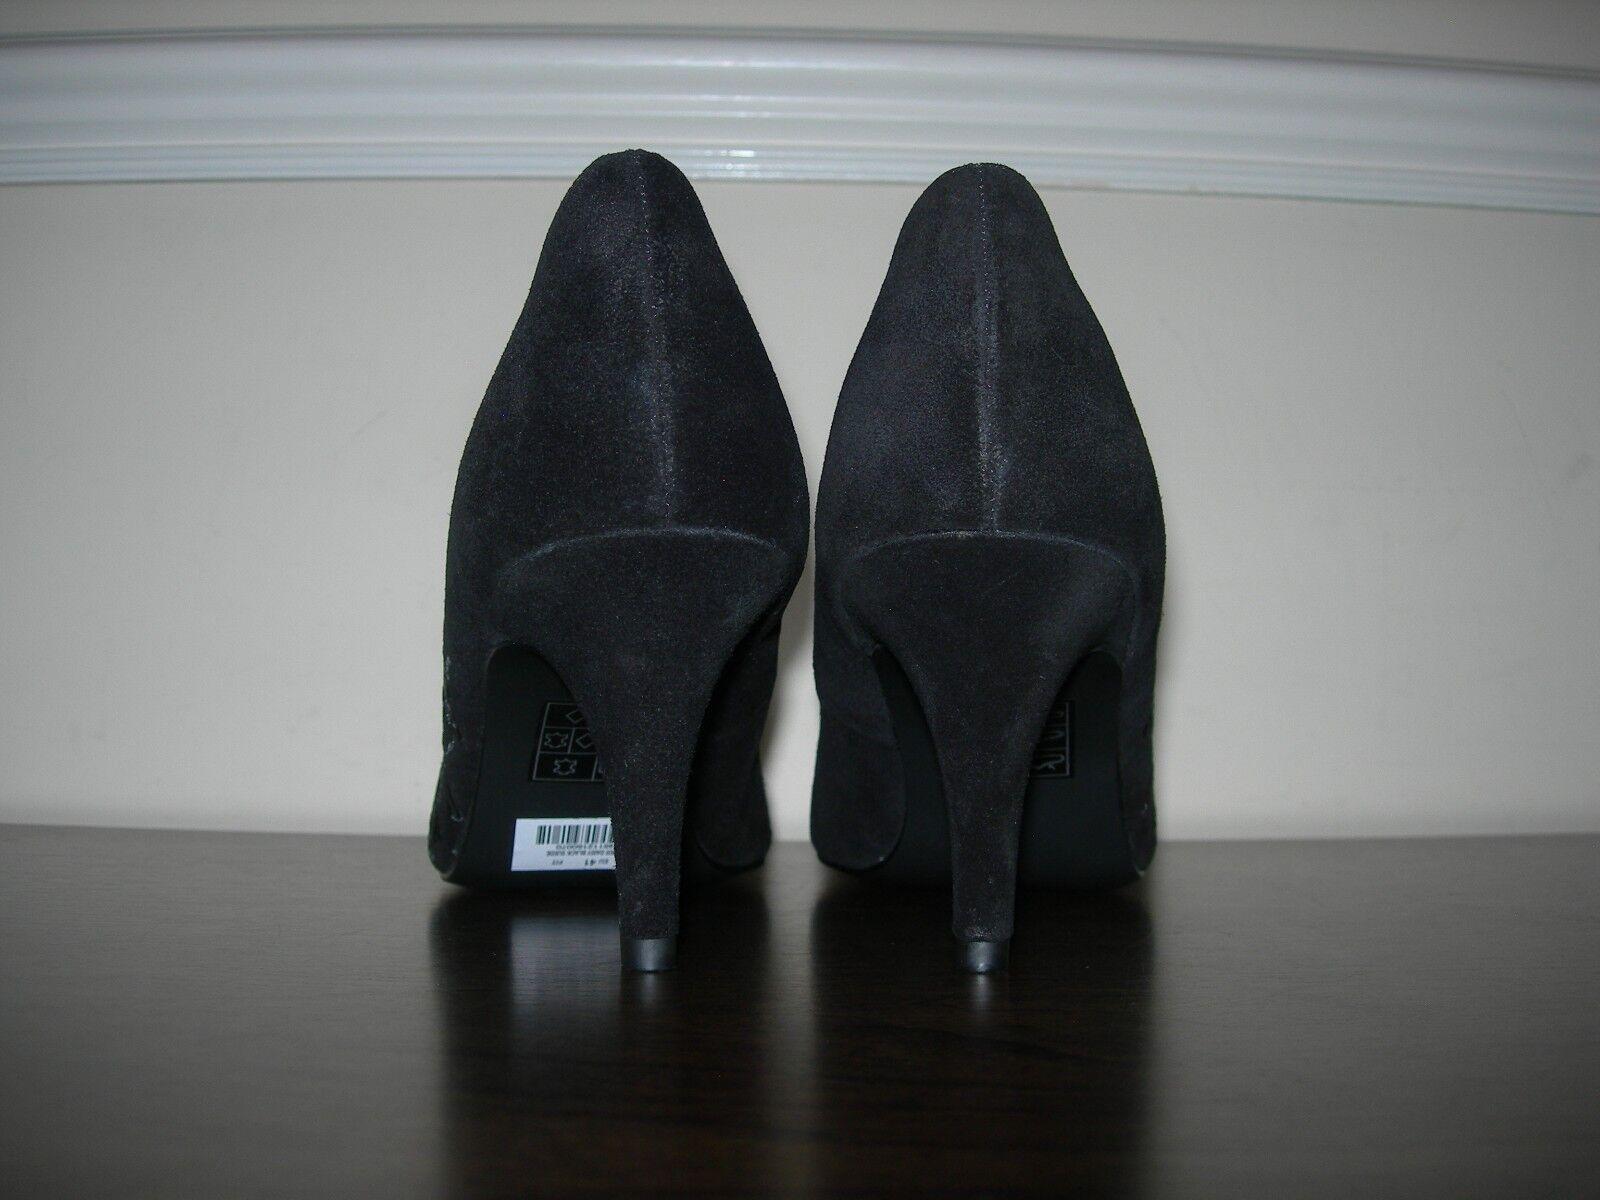 Clarks Mujer Tribunal Zapatos EU Tacones Negro Gamuza Detalle Bordado EU Zapatos 40 UK 7 277f2b